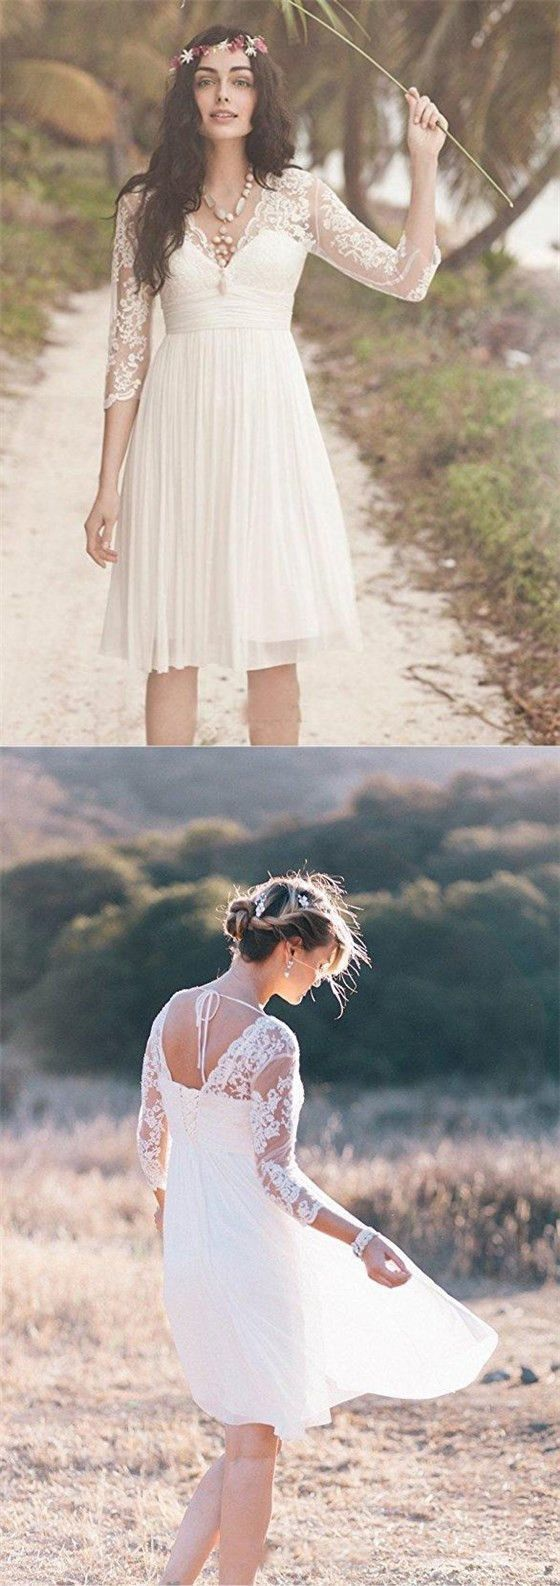 Long Sleeve Lace Short Beach Wedding Dresses By Rosyprom 185 91 Usd Short Wedding Dress Beach Long Sleeve Short Wedding Dress Wedding Dress Long Sleeve [ 1586 x 560 Pixel ]